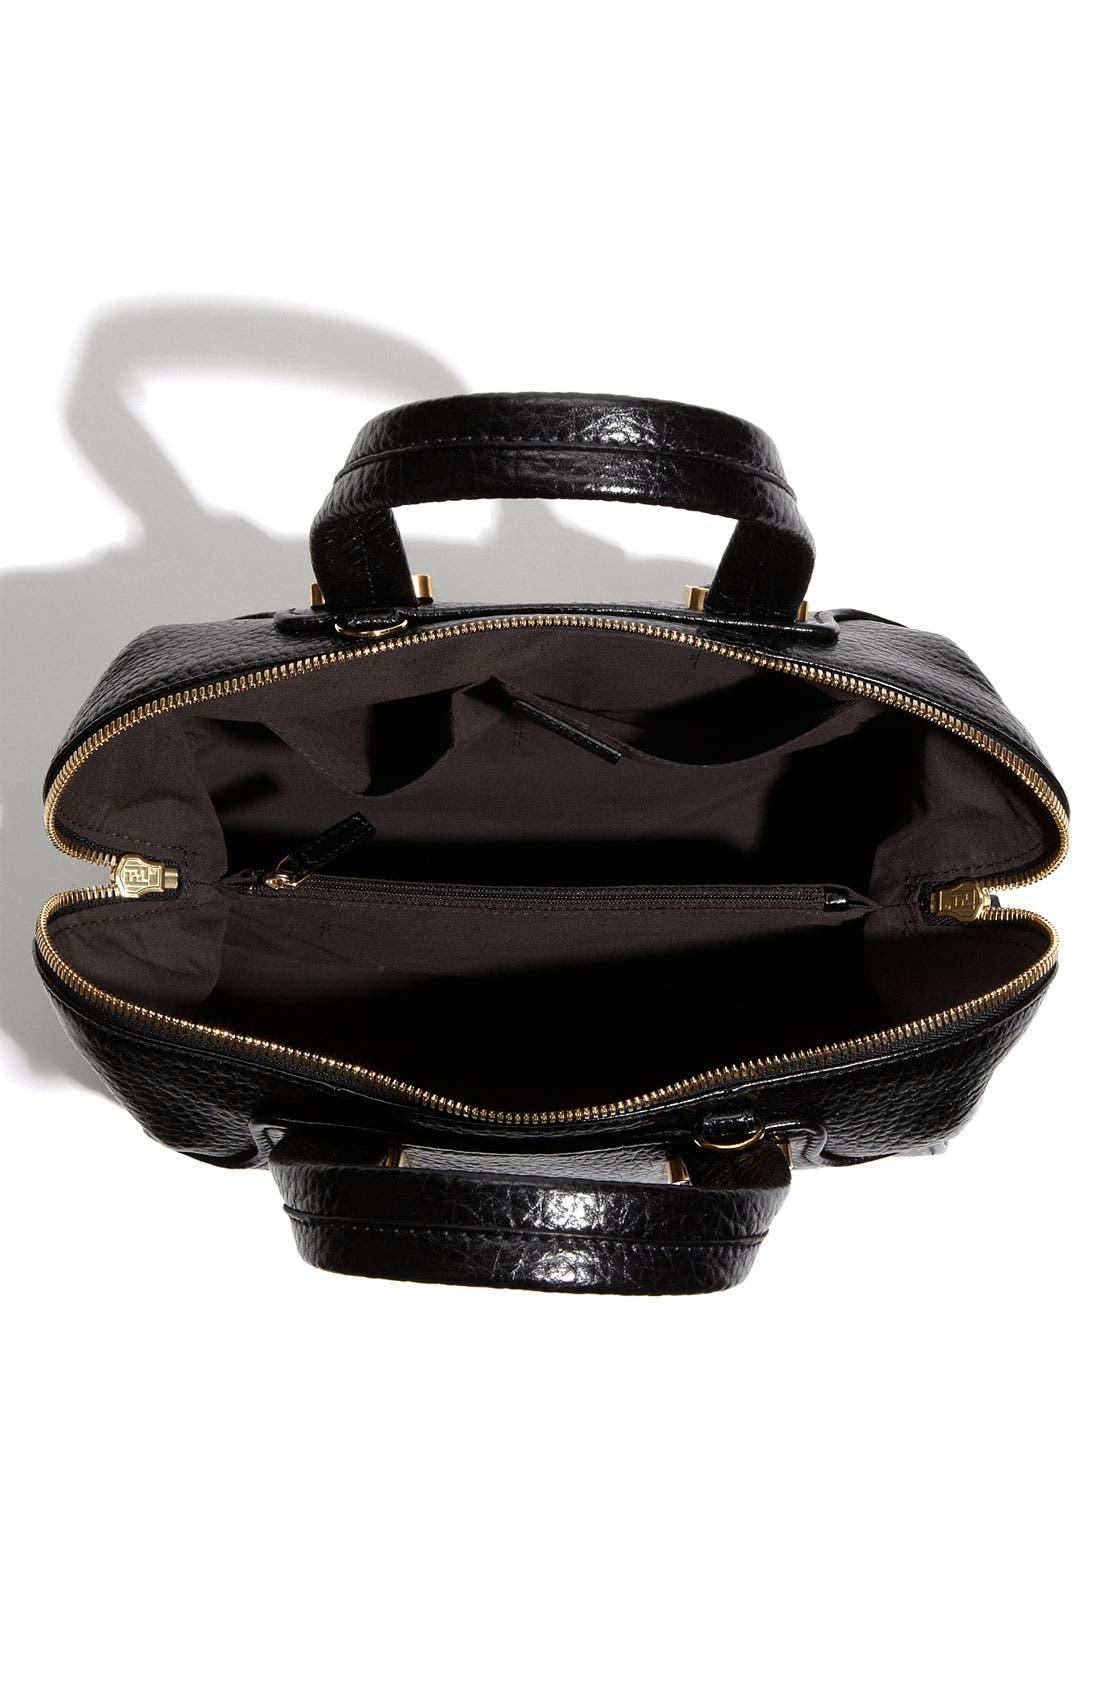 Alternate Image 3  - Fendi 'Chameleon - Small' Leather Tote